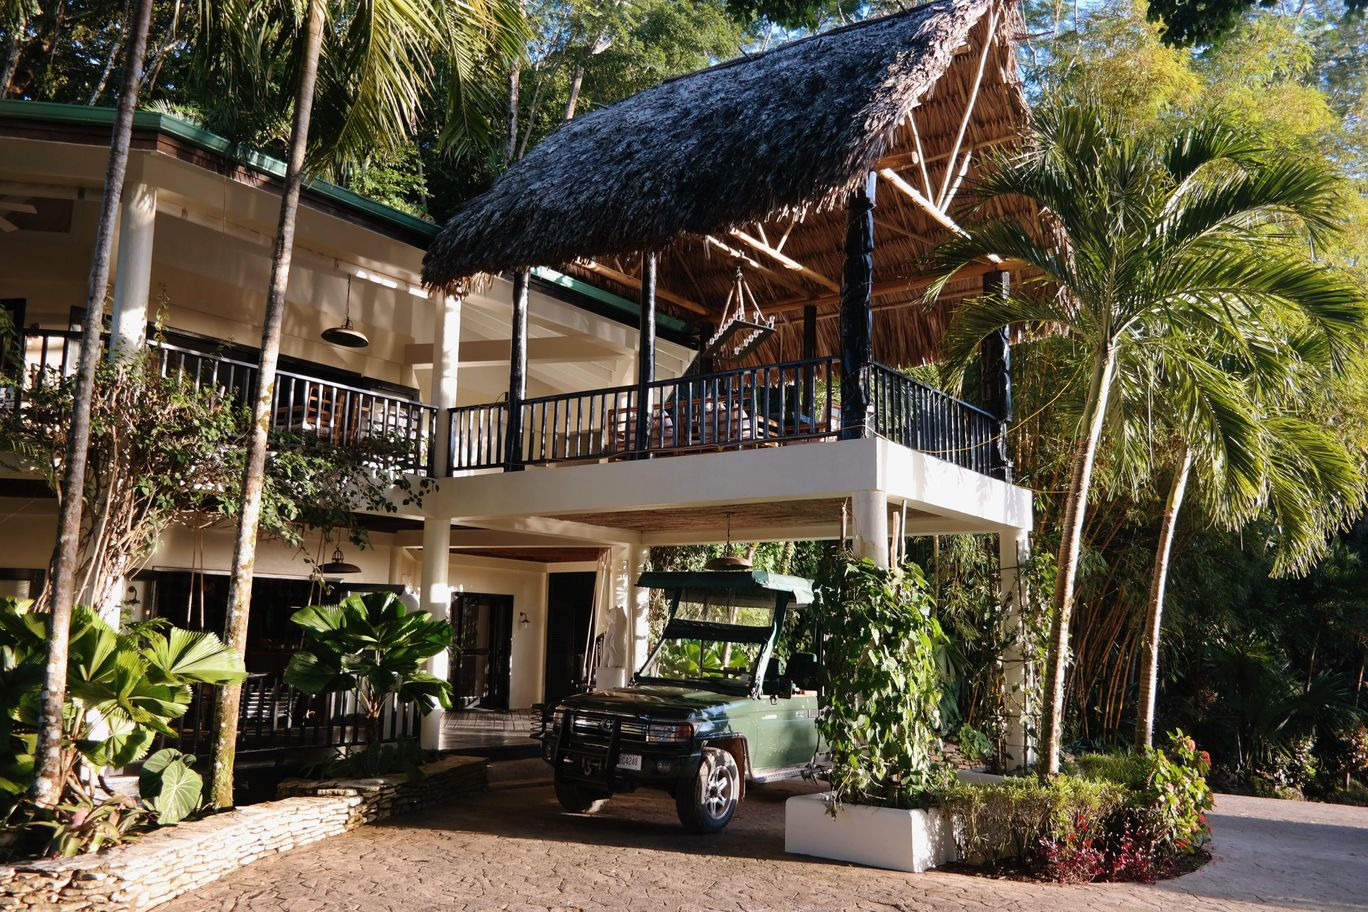 Copal Tree Lodge Lobby.jpeg